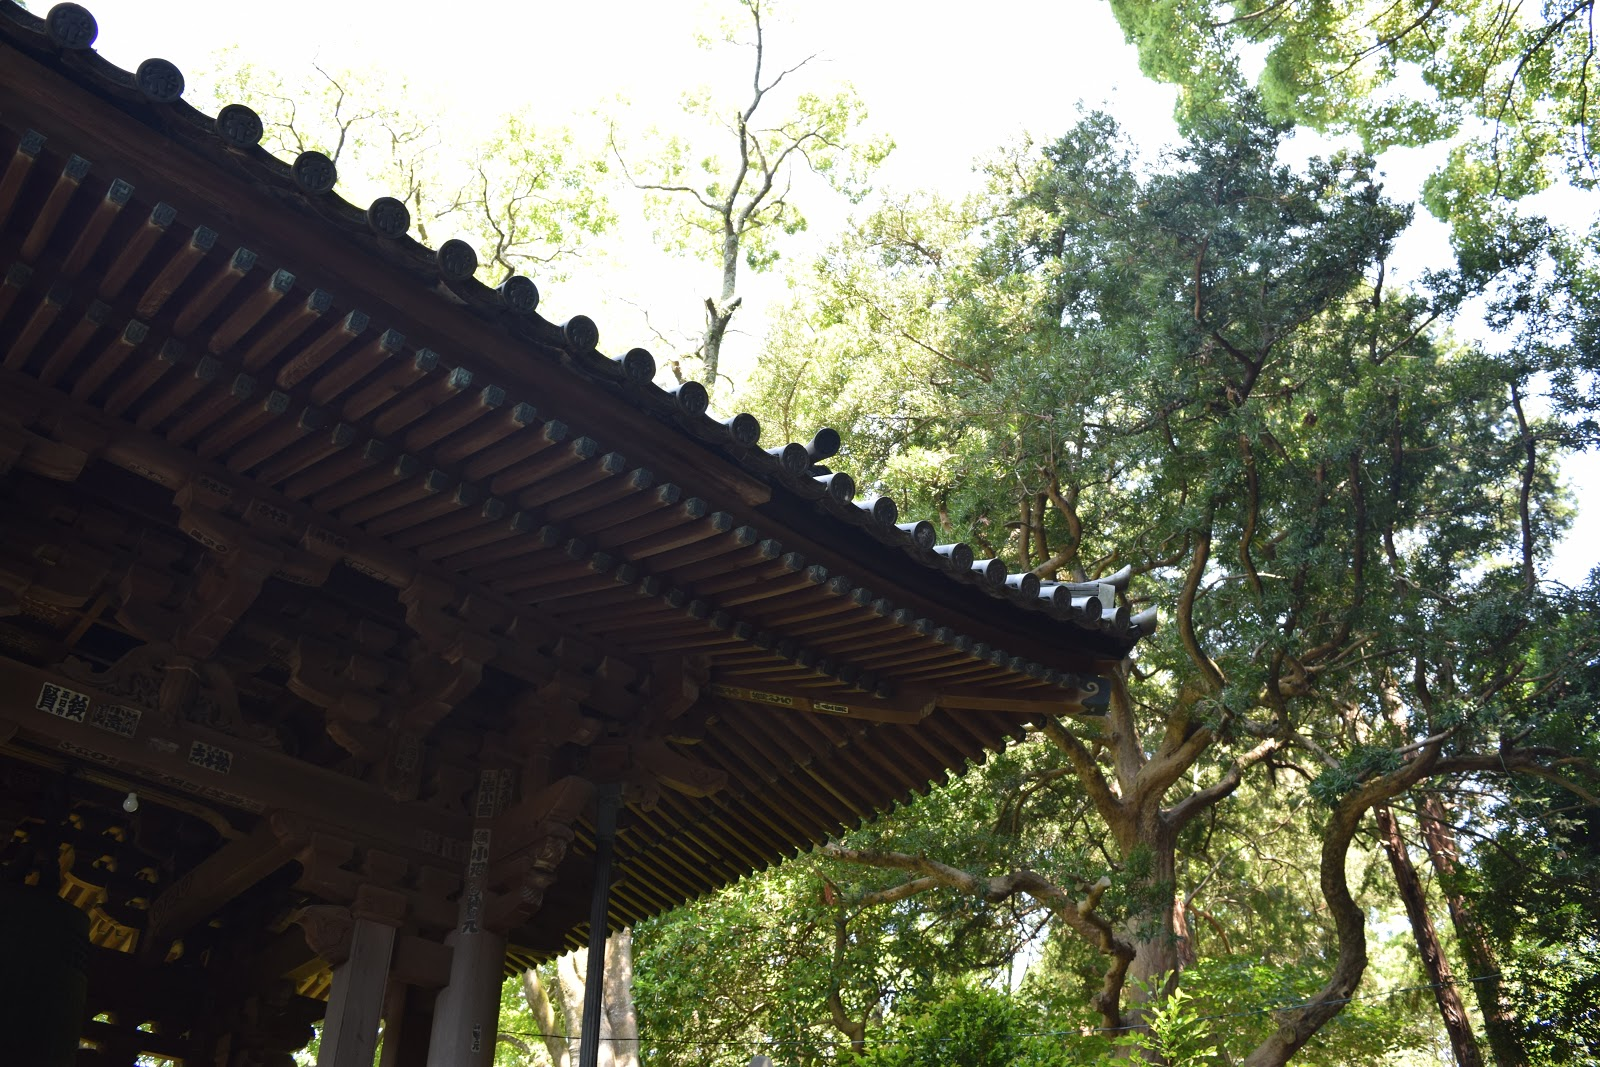 Temple roof in Kiyomizudera Shizuoka city